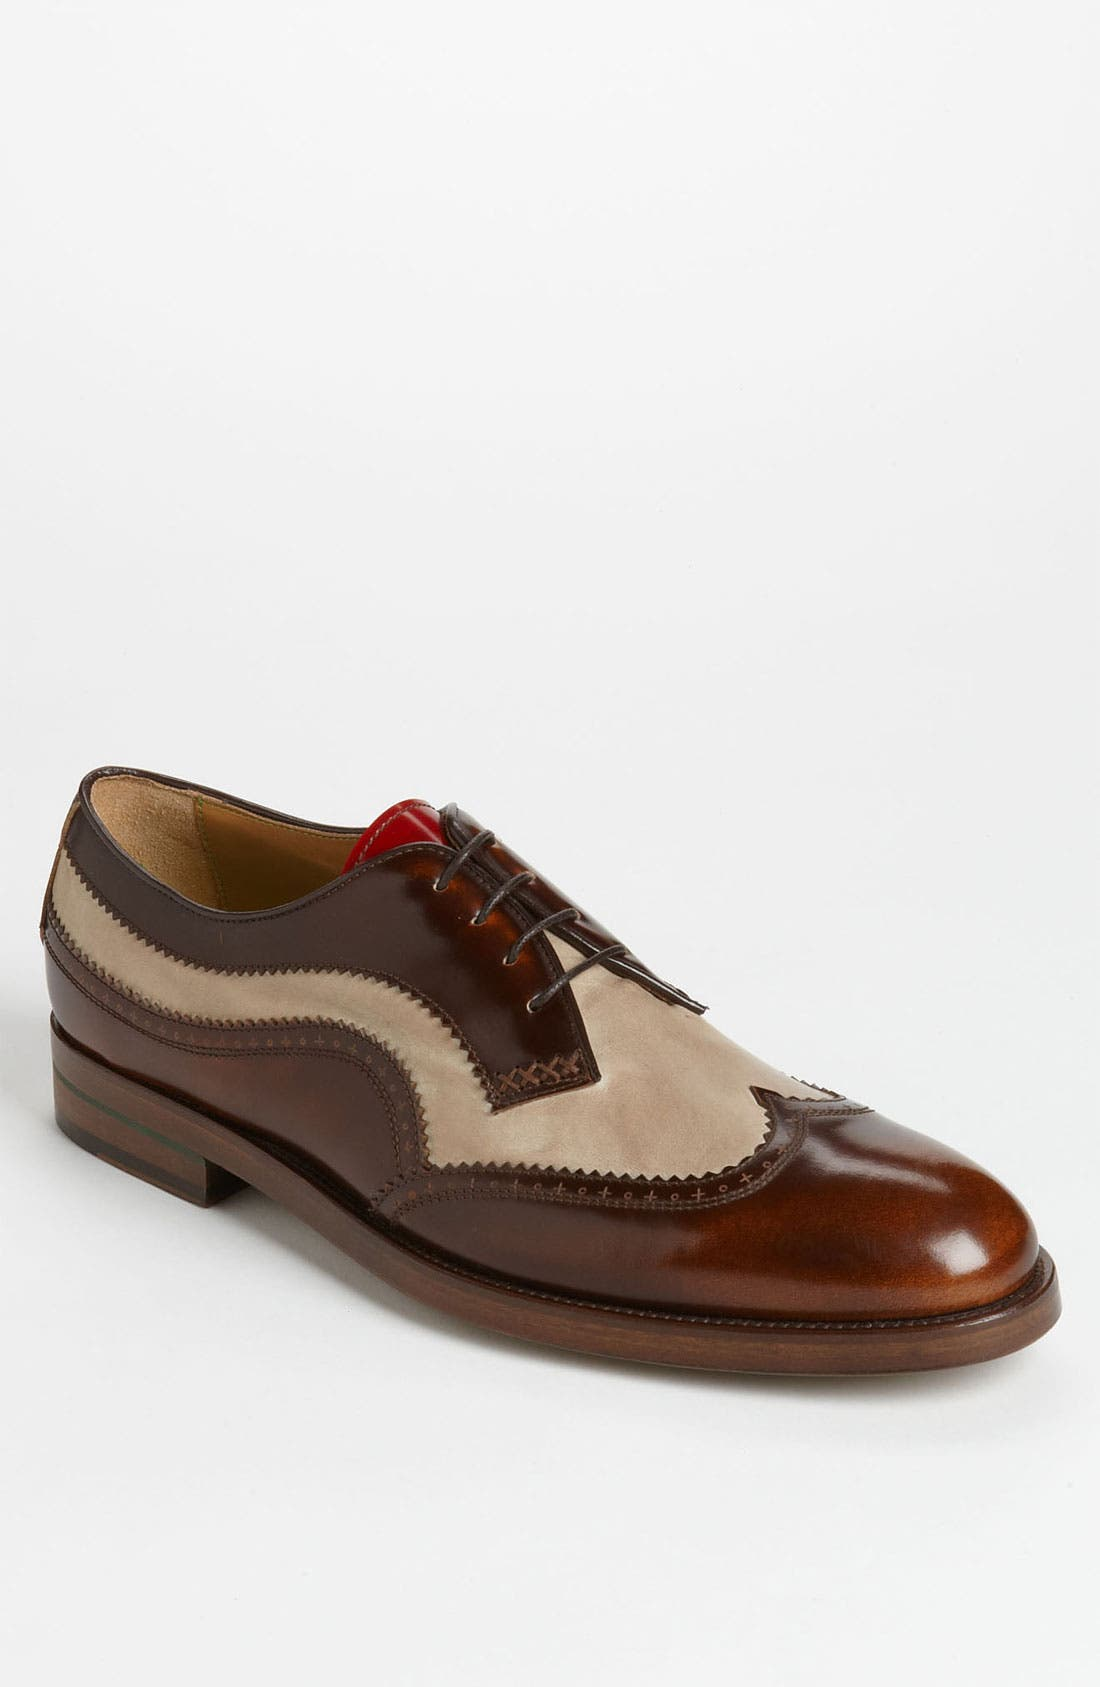 Alternate Image 1 Selected - Oliver Sweeney 'Salento' Spectator Shoe